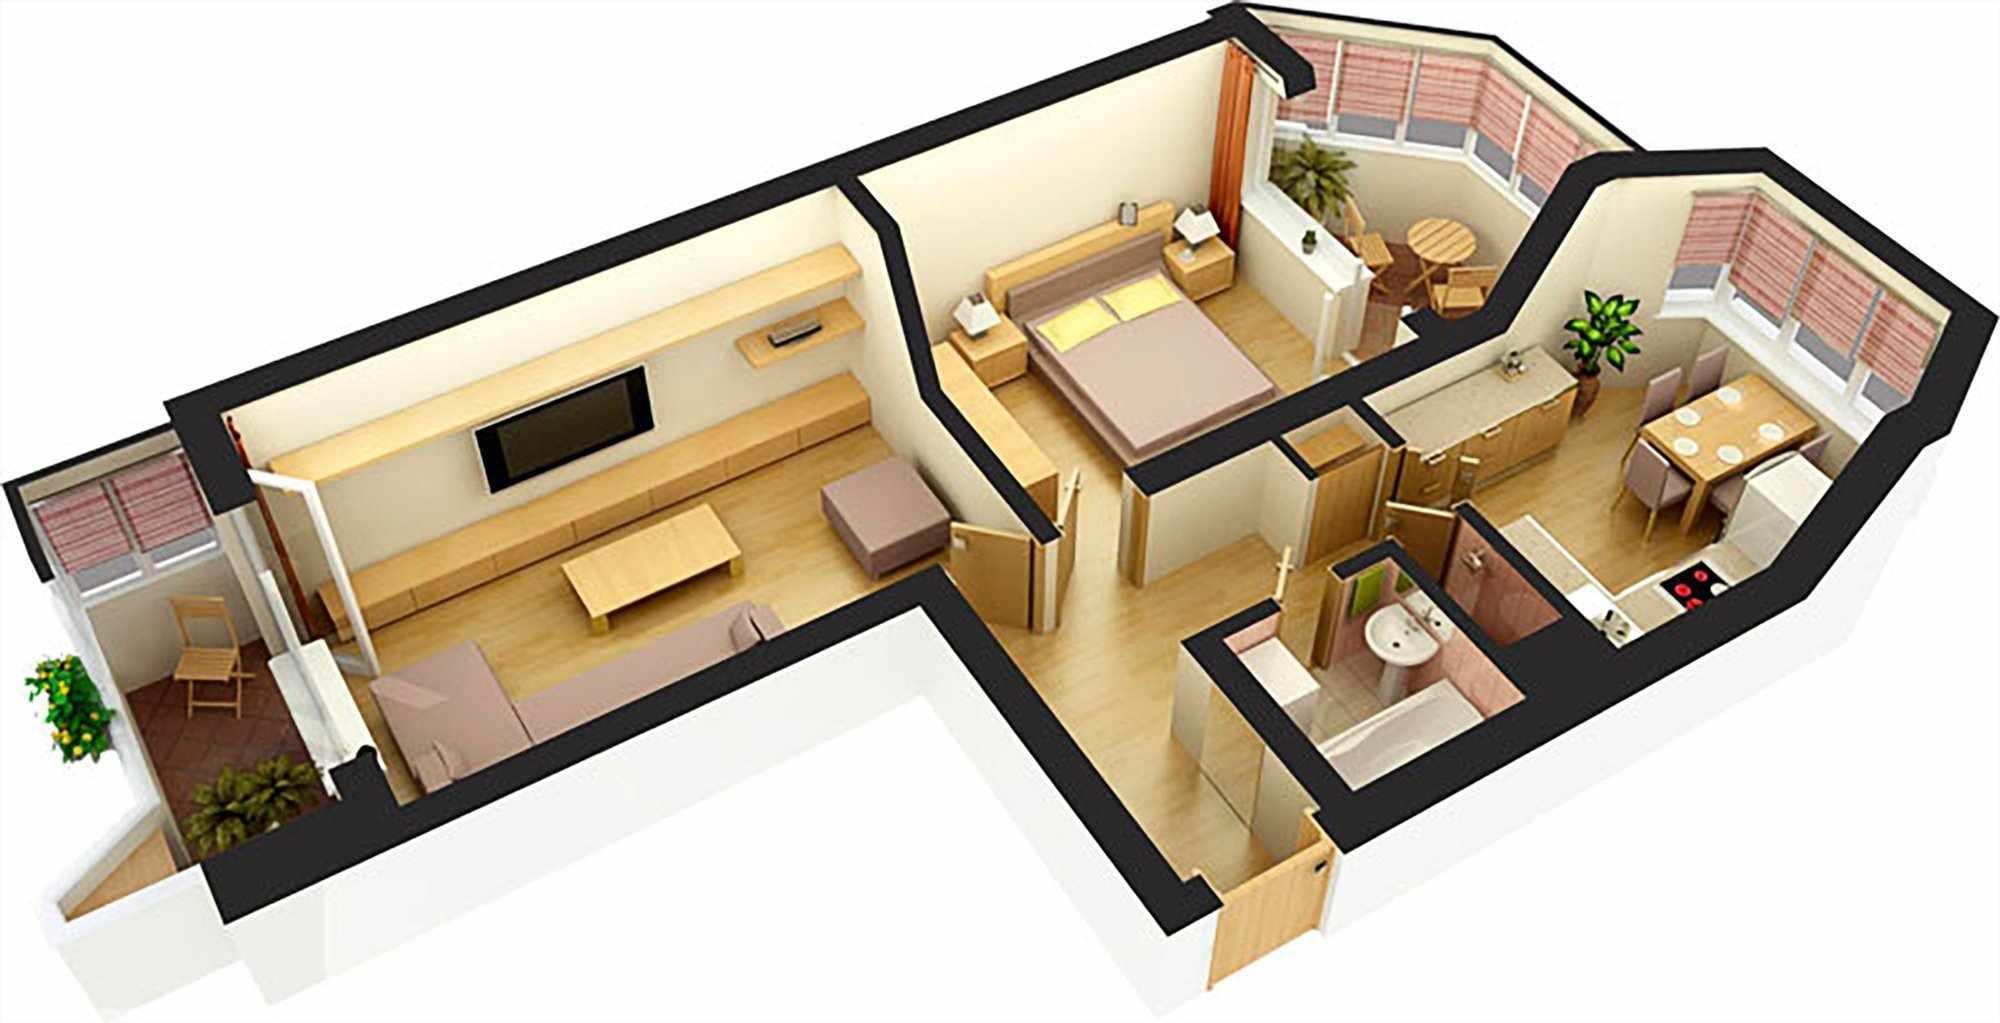 3Д-проект просторной квартиры